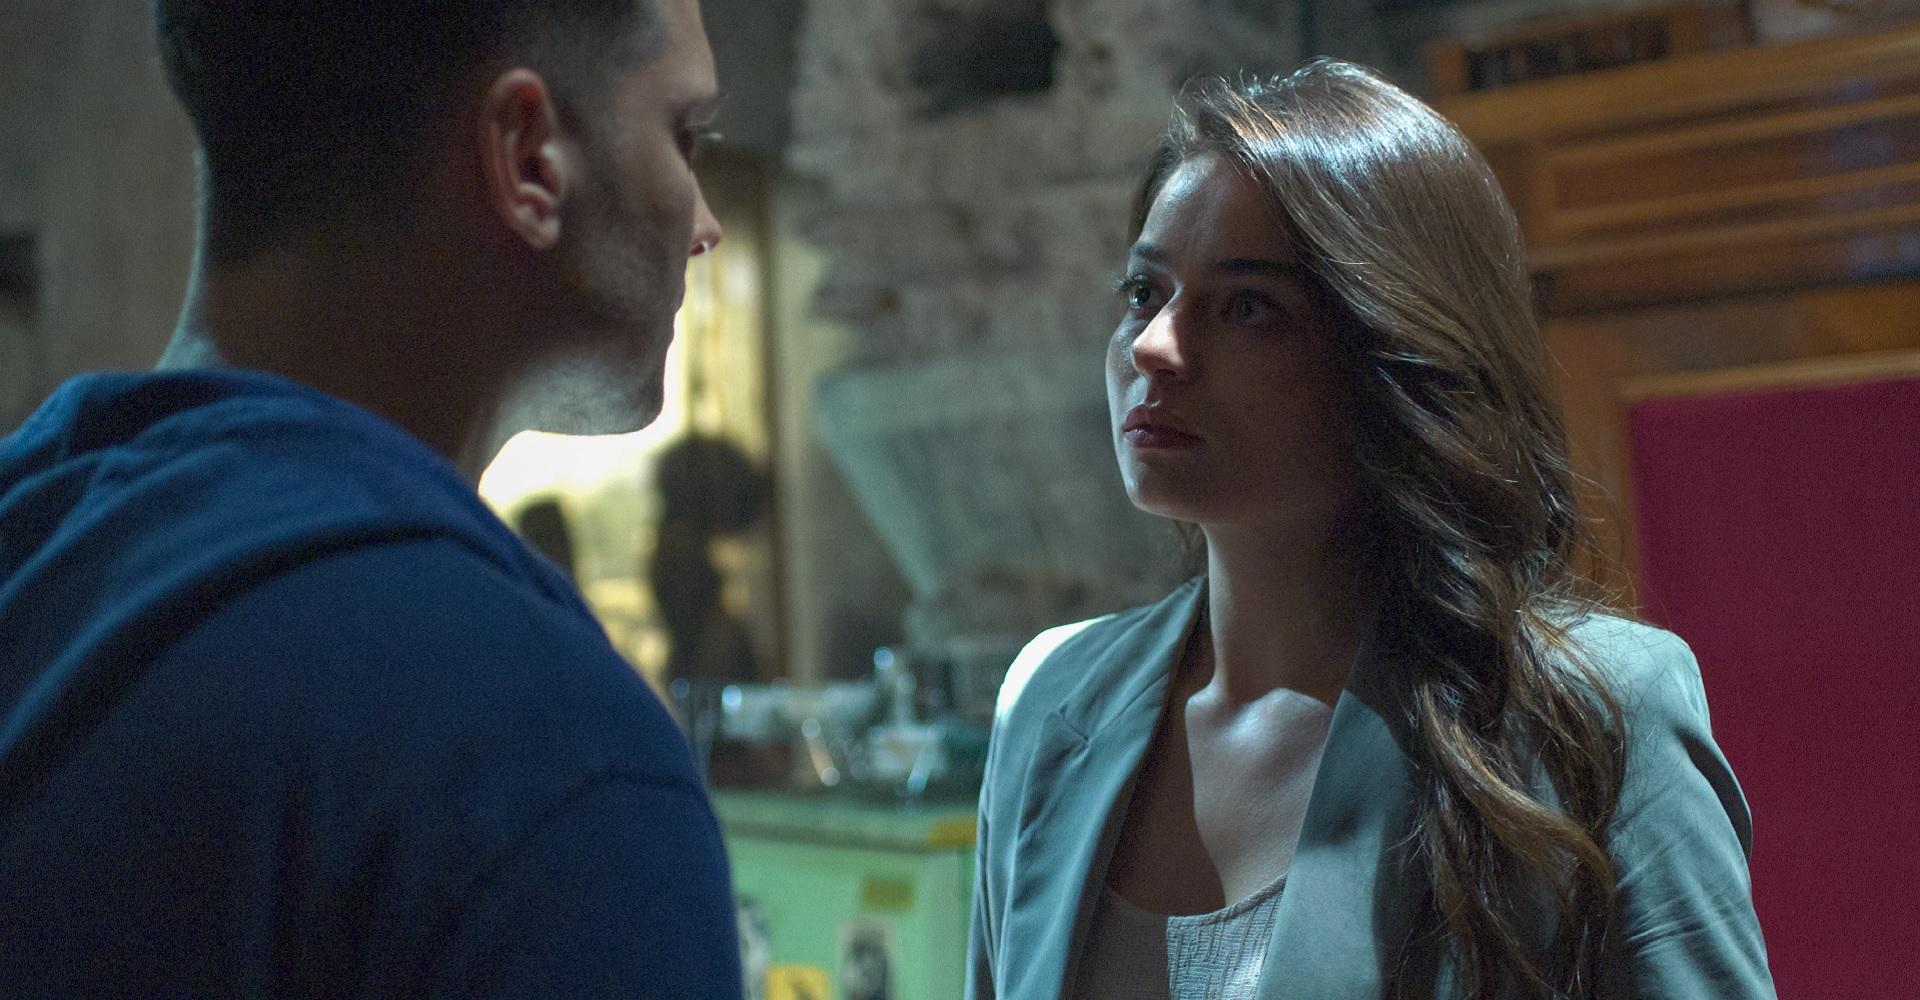 Ayça Aysin Turan als Leyla Sancak in The Protector